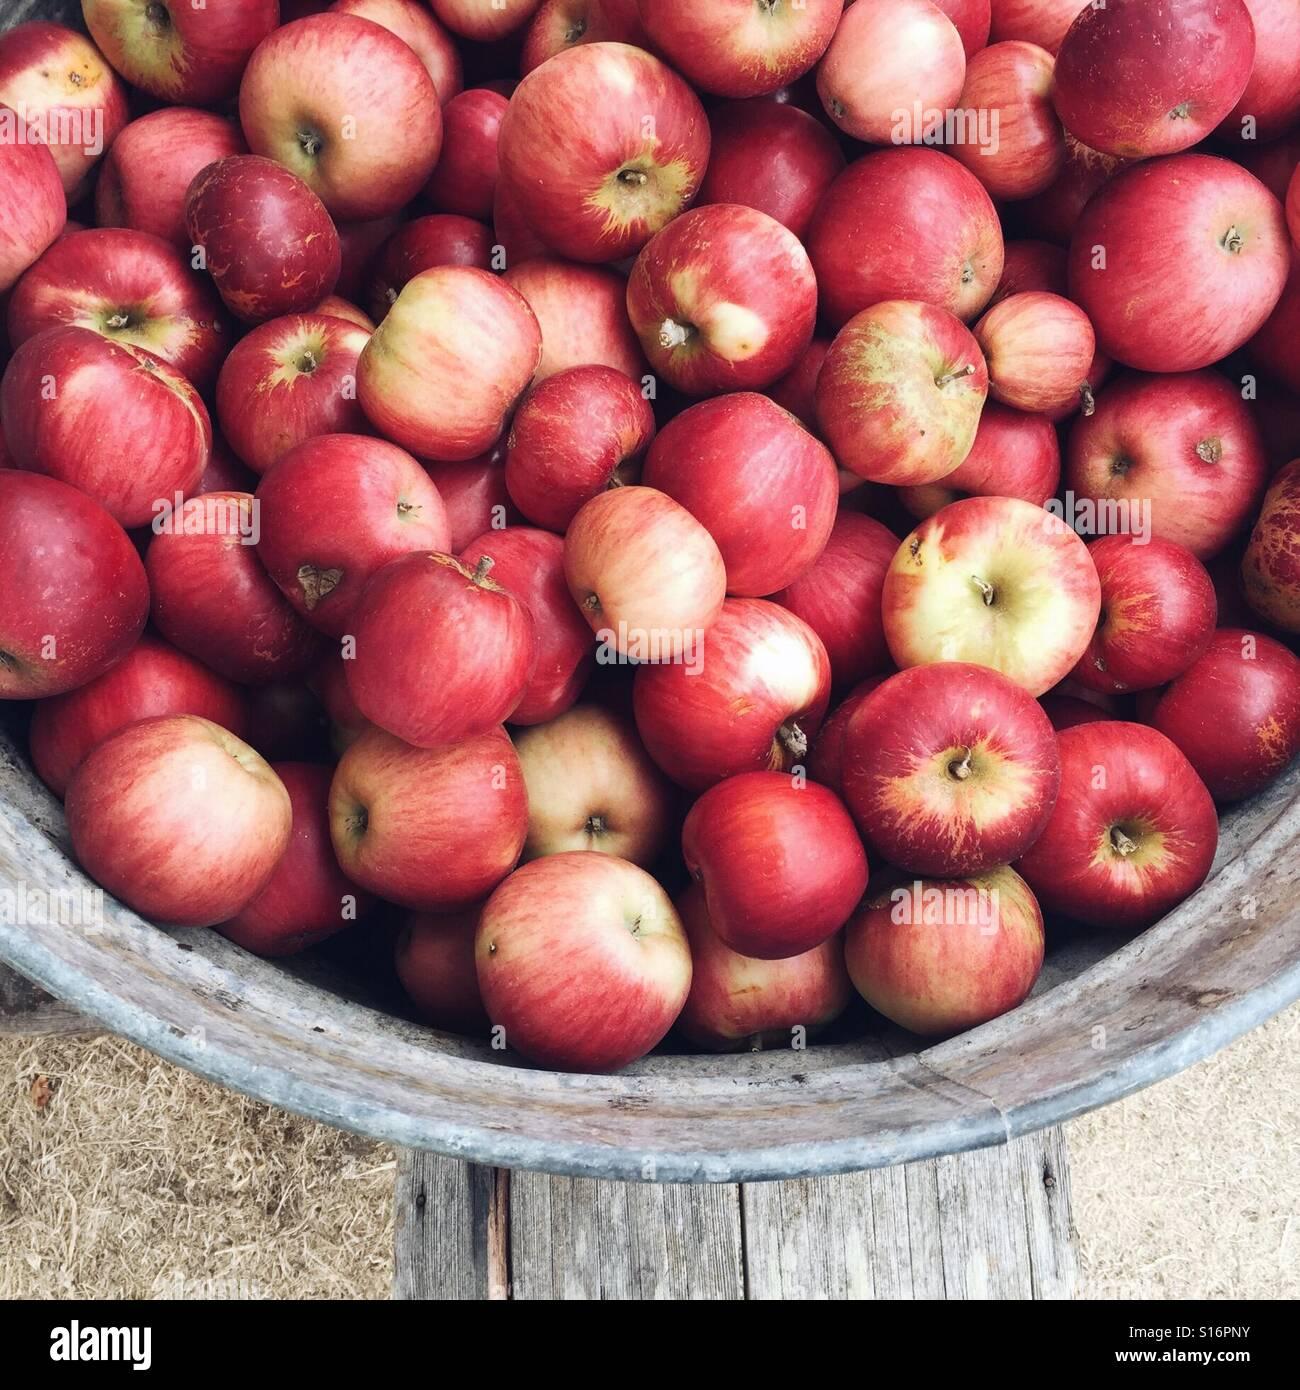 bucket of apples - Stock Image